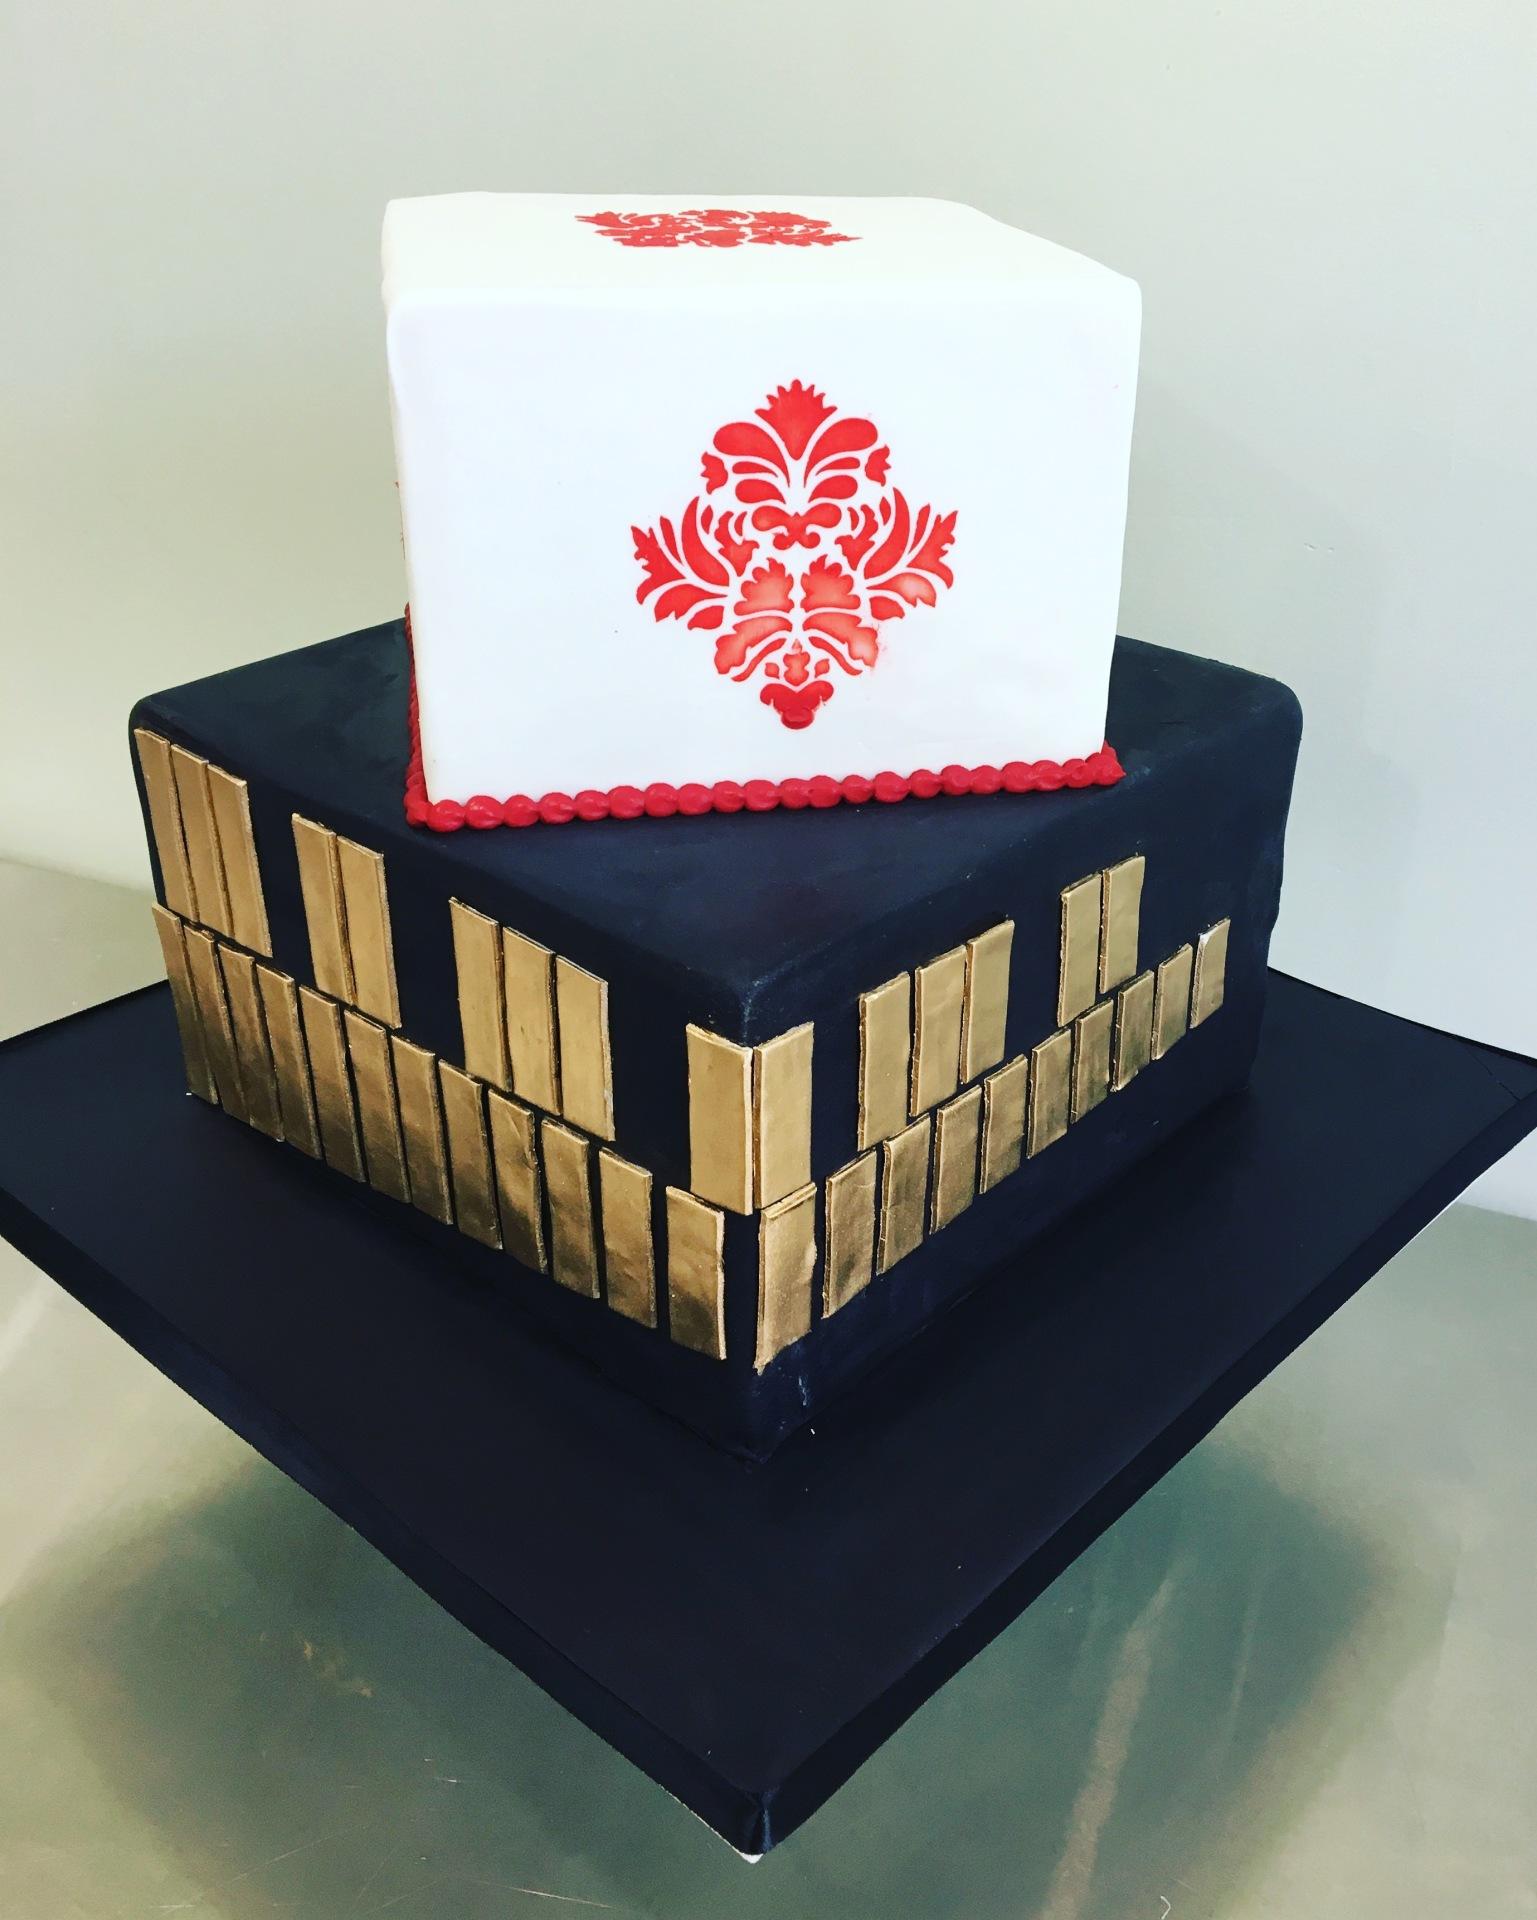 vibraphone wedding cake square cake damask pattern cake